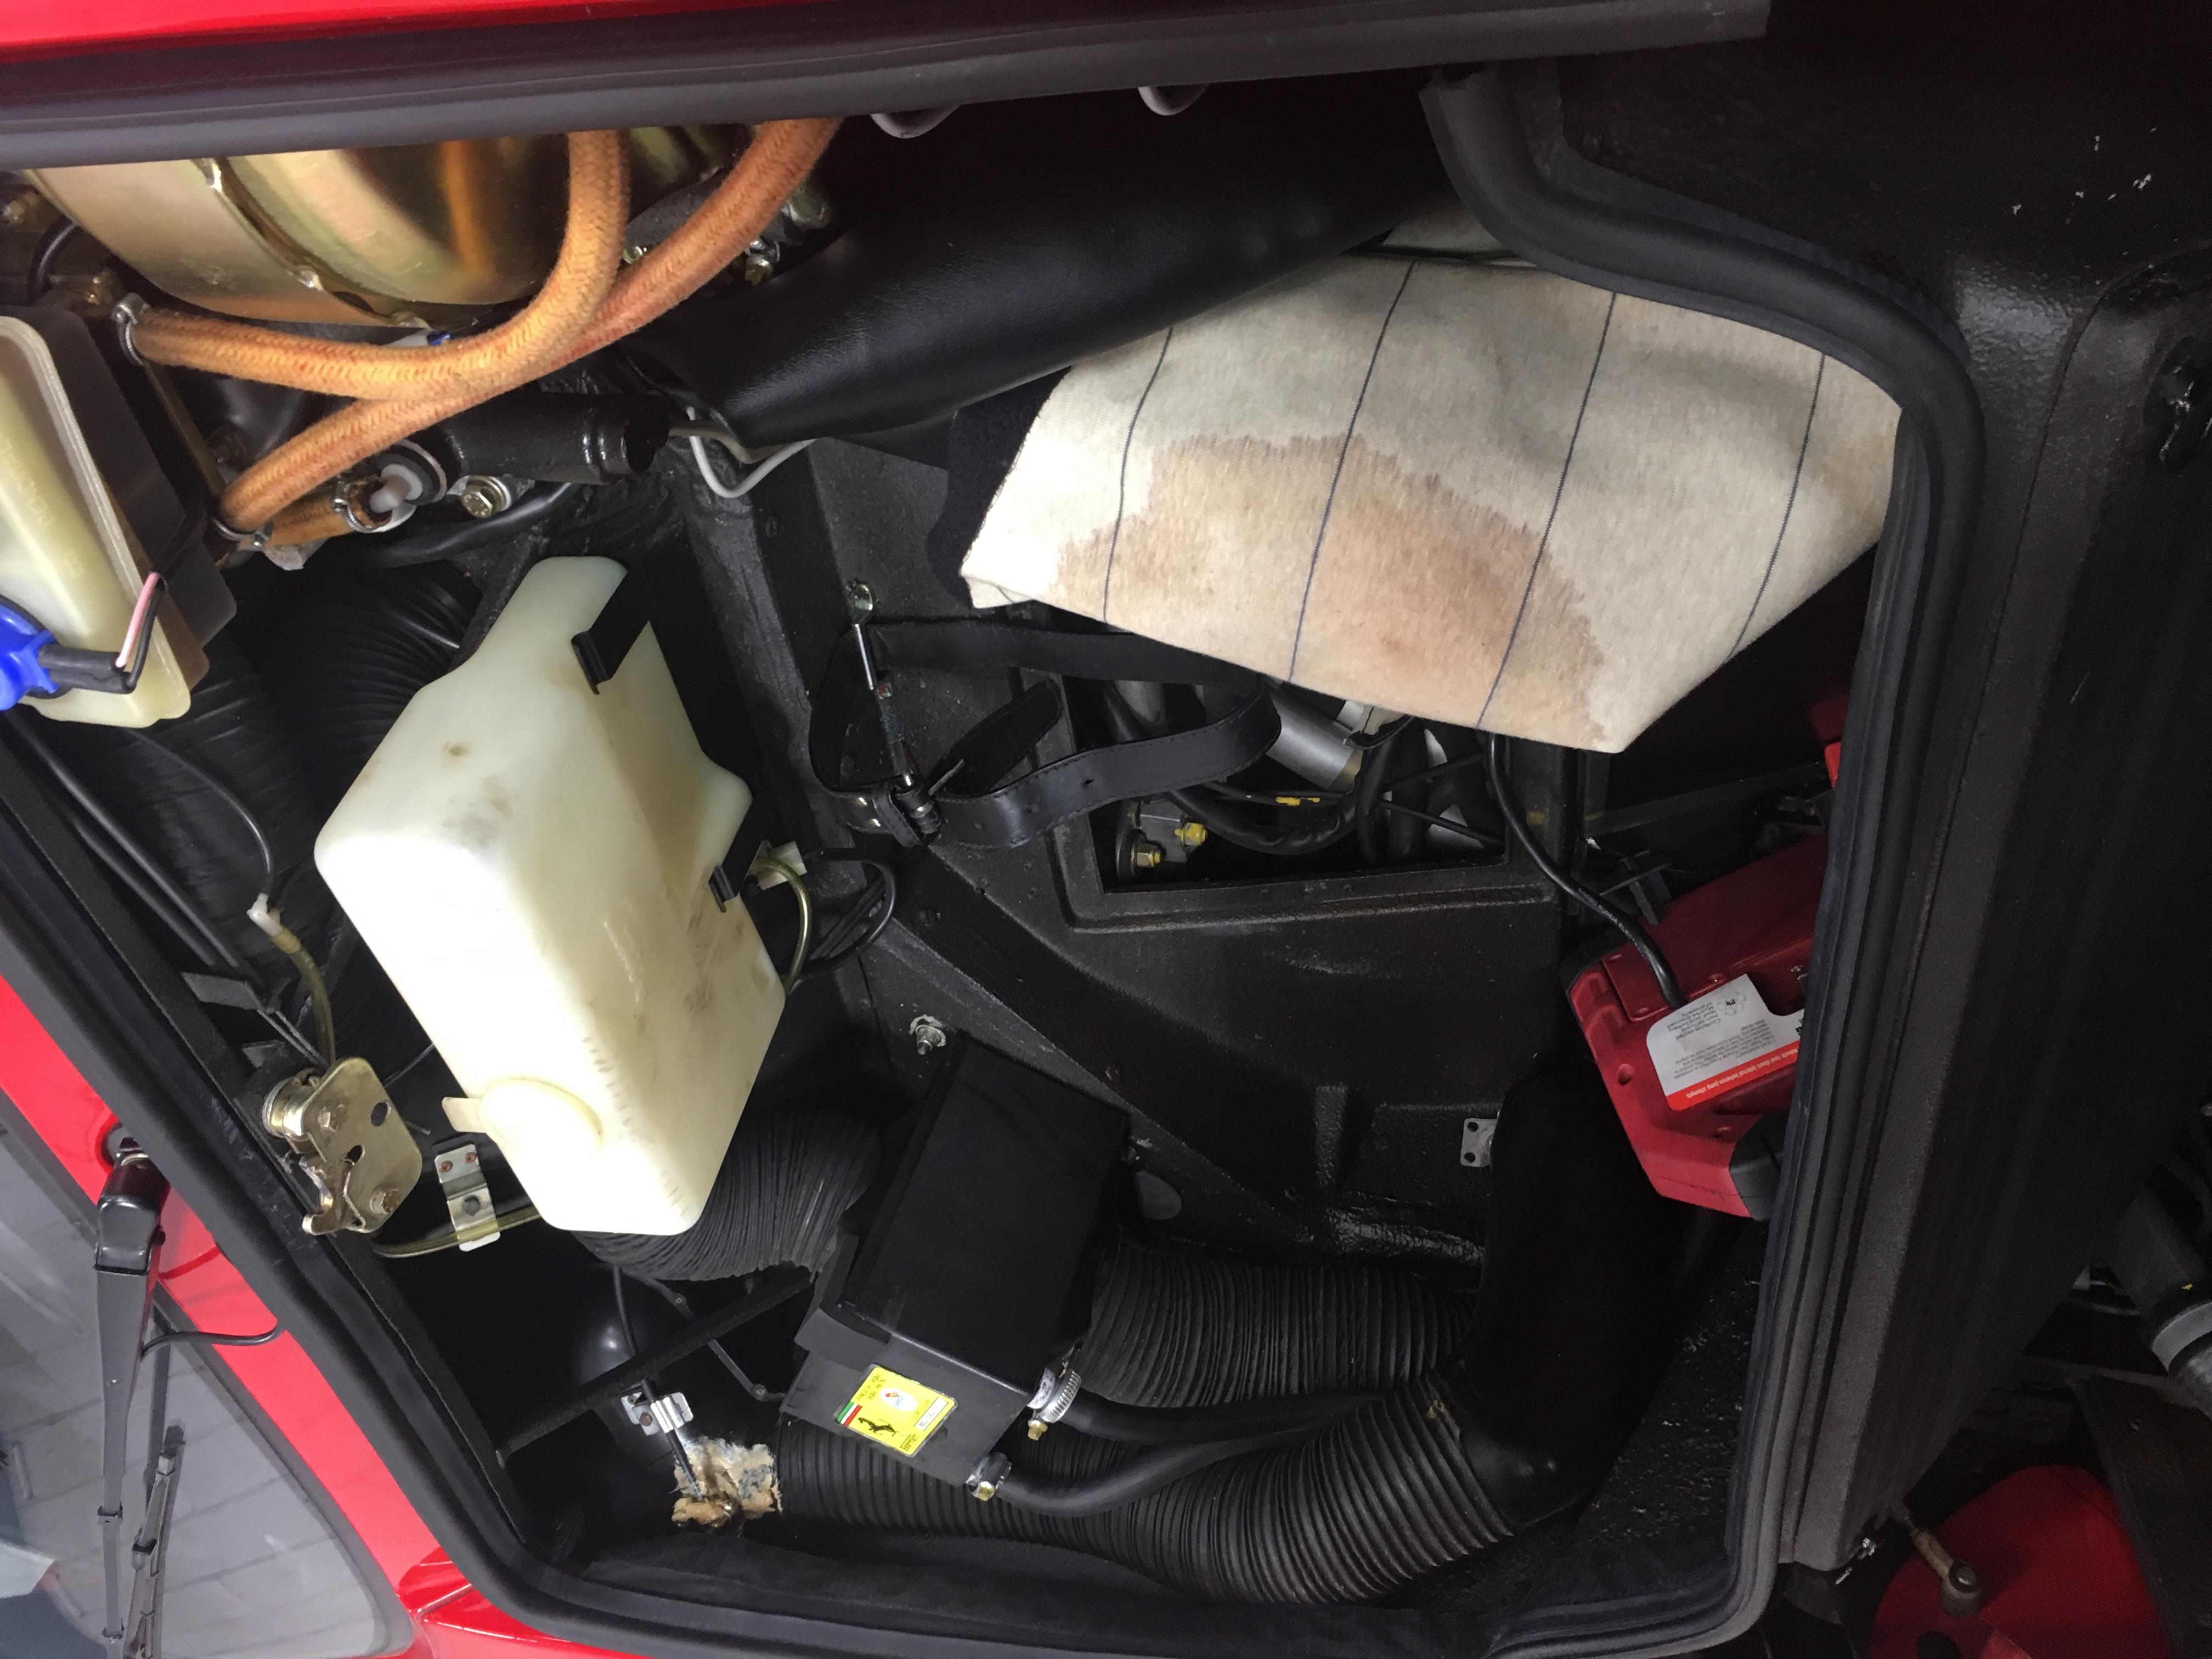 dirtyoldcars.com 1985 Ferrari 288 GTO: Only 700 KM 6